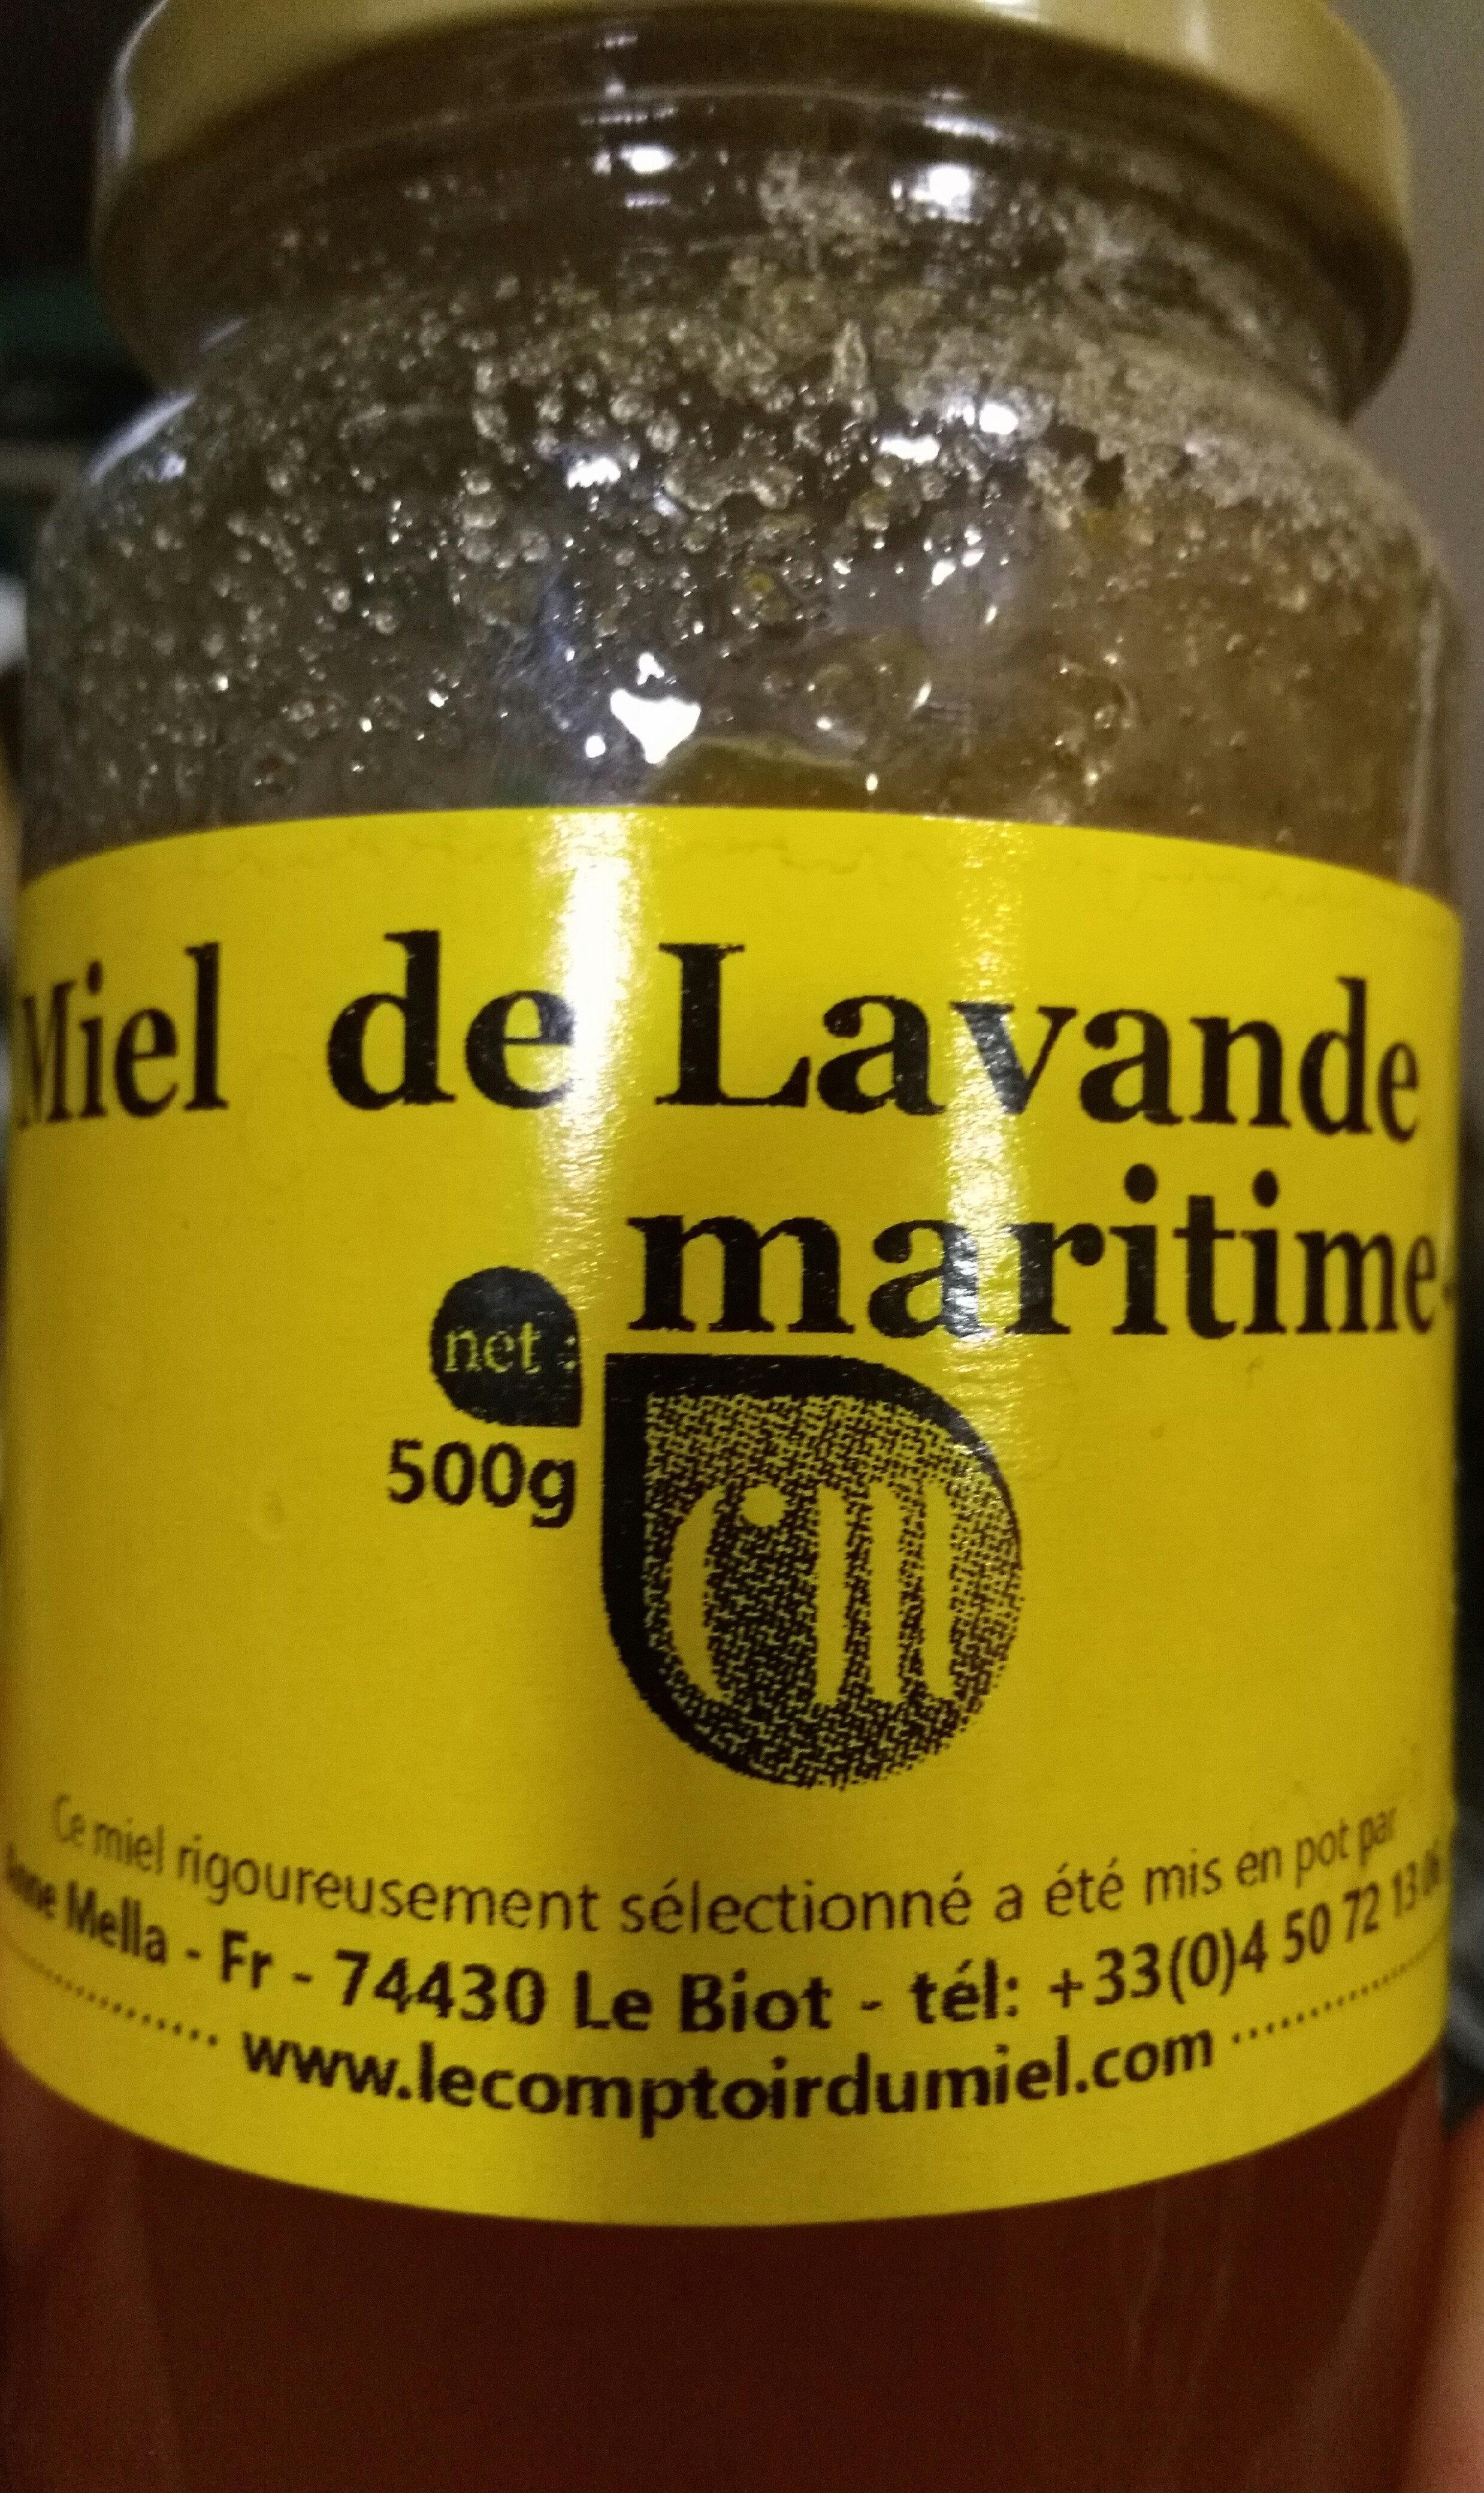 Miel de Lavande maritime - Producto - fr